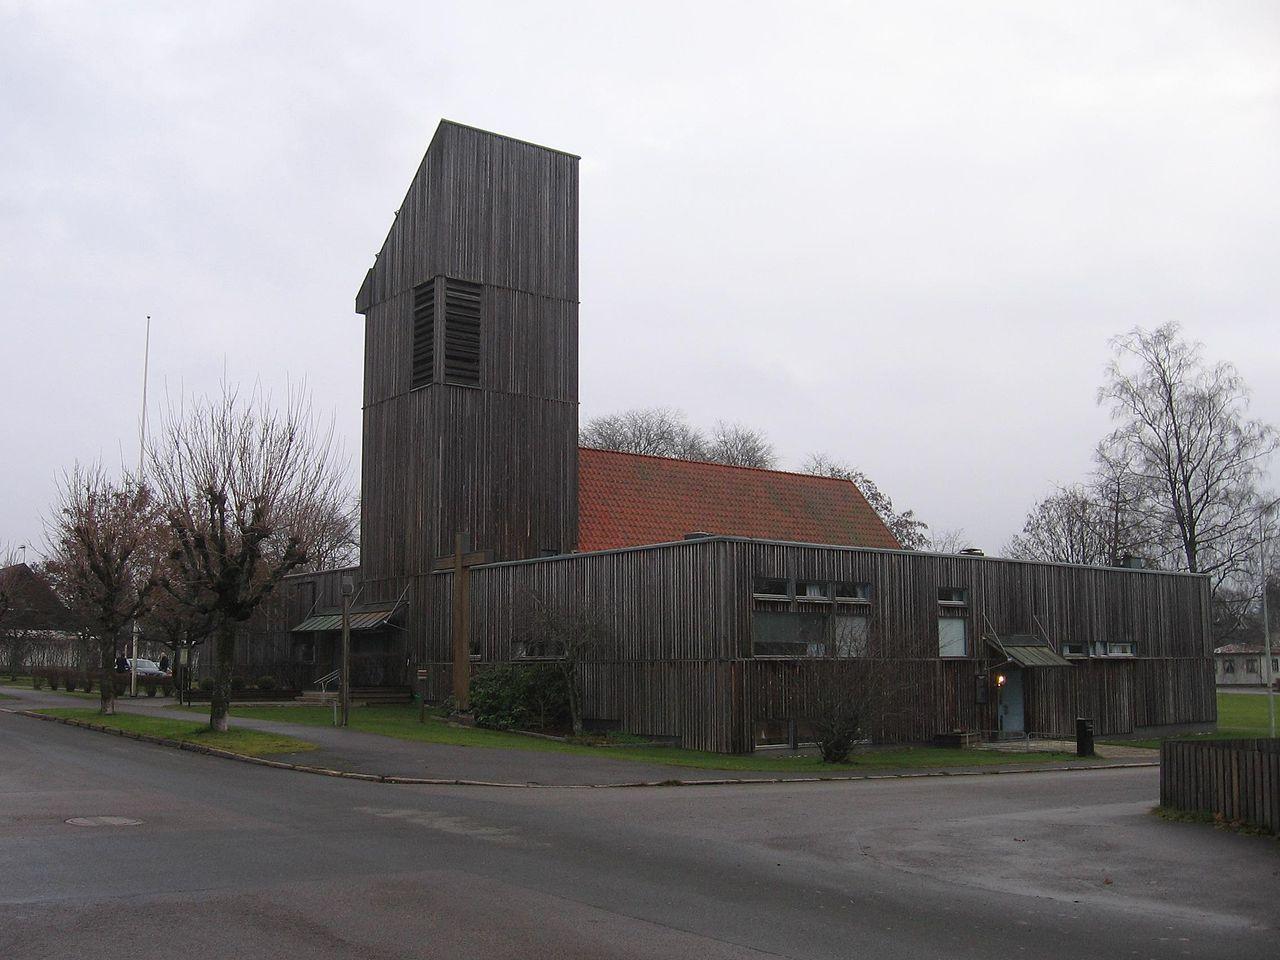 Semesterhus - Vare/Bodafors, Sverige - S05761 | Novasol